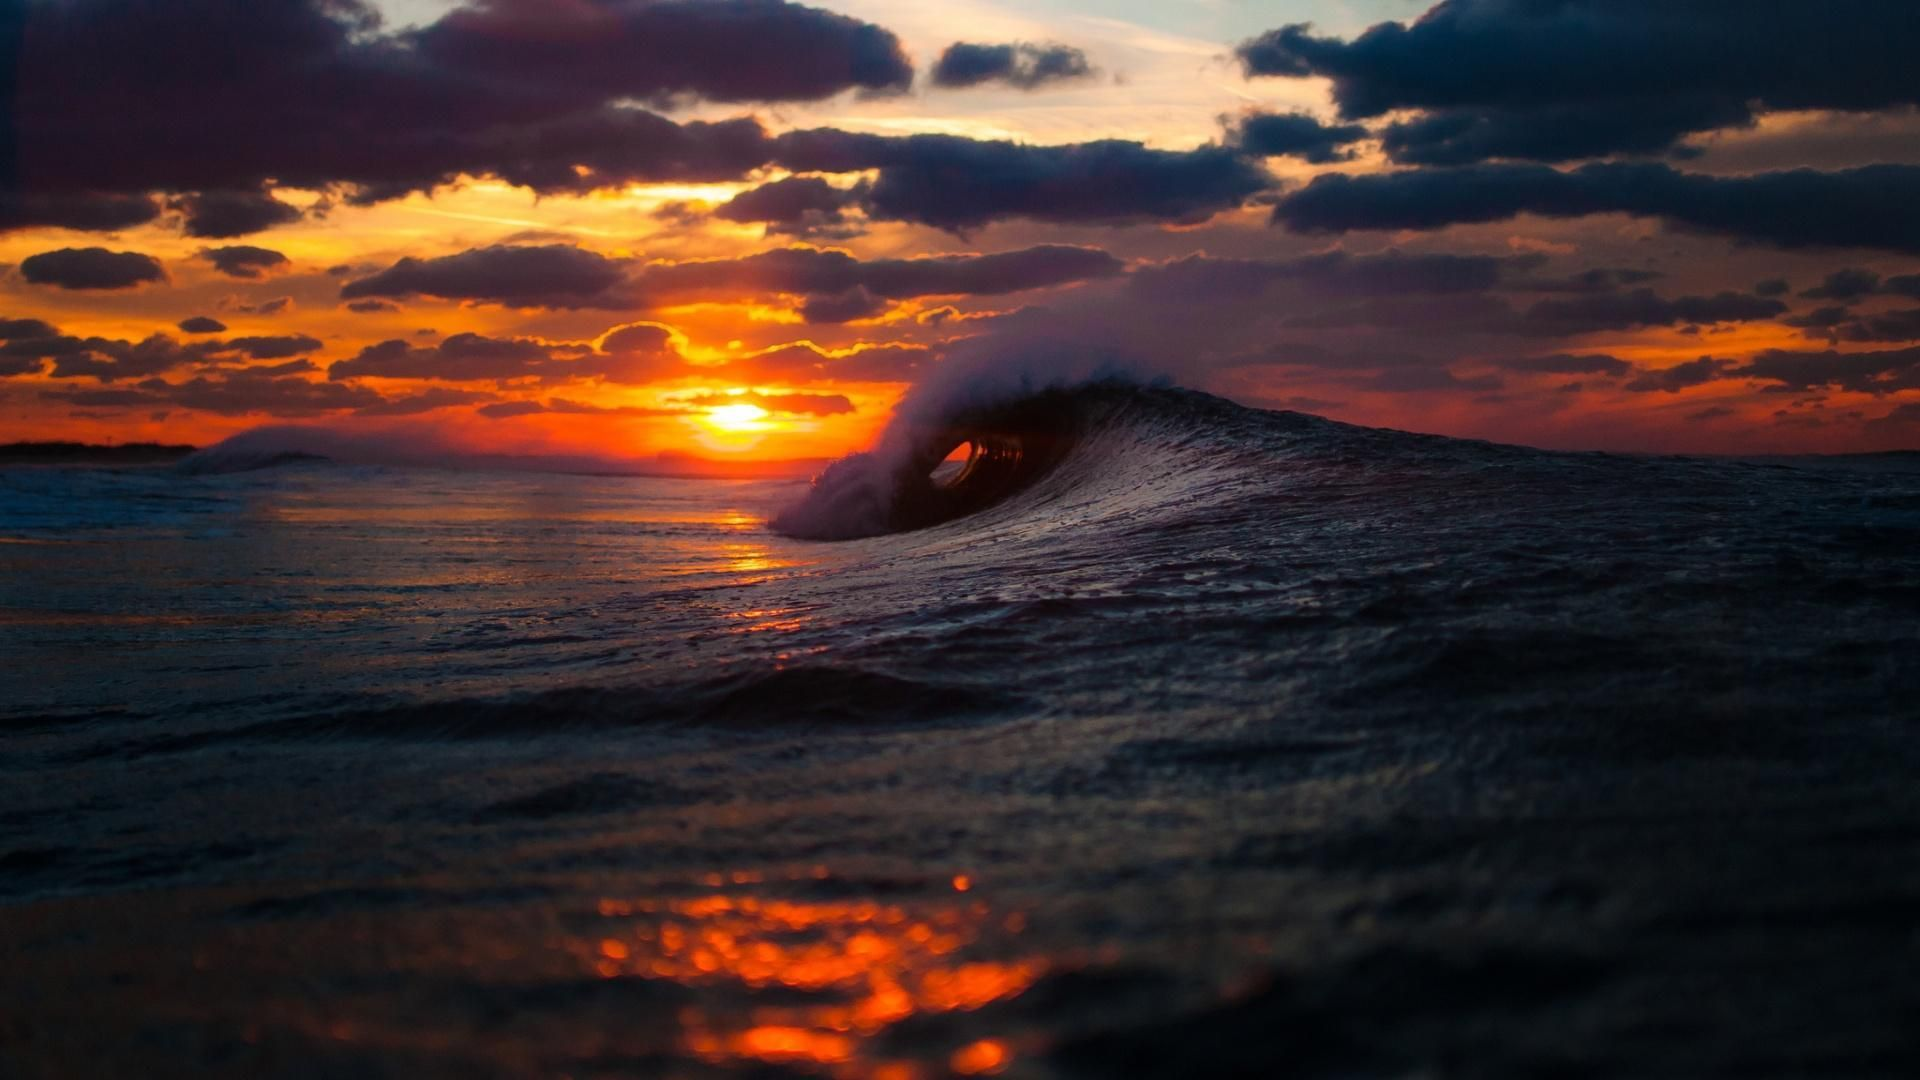 aesthetic sunset desktop wallpapers